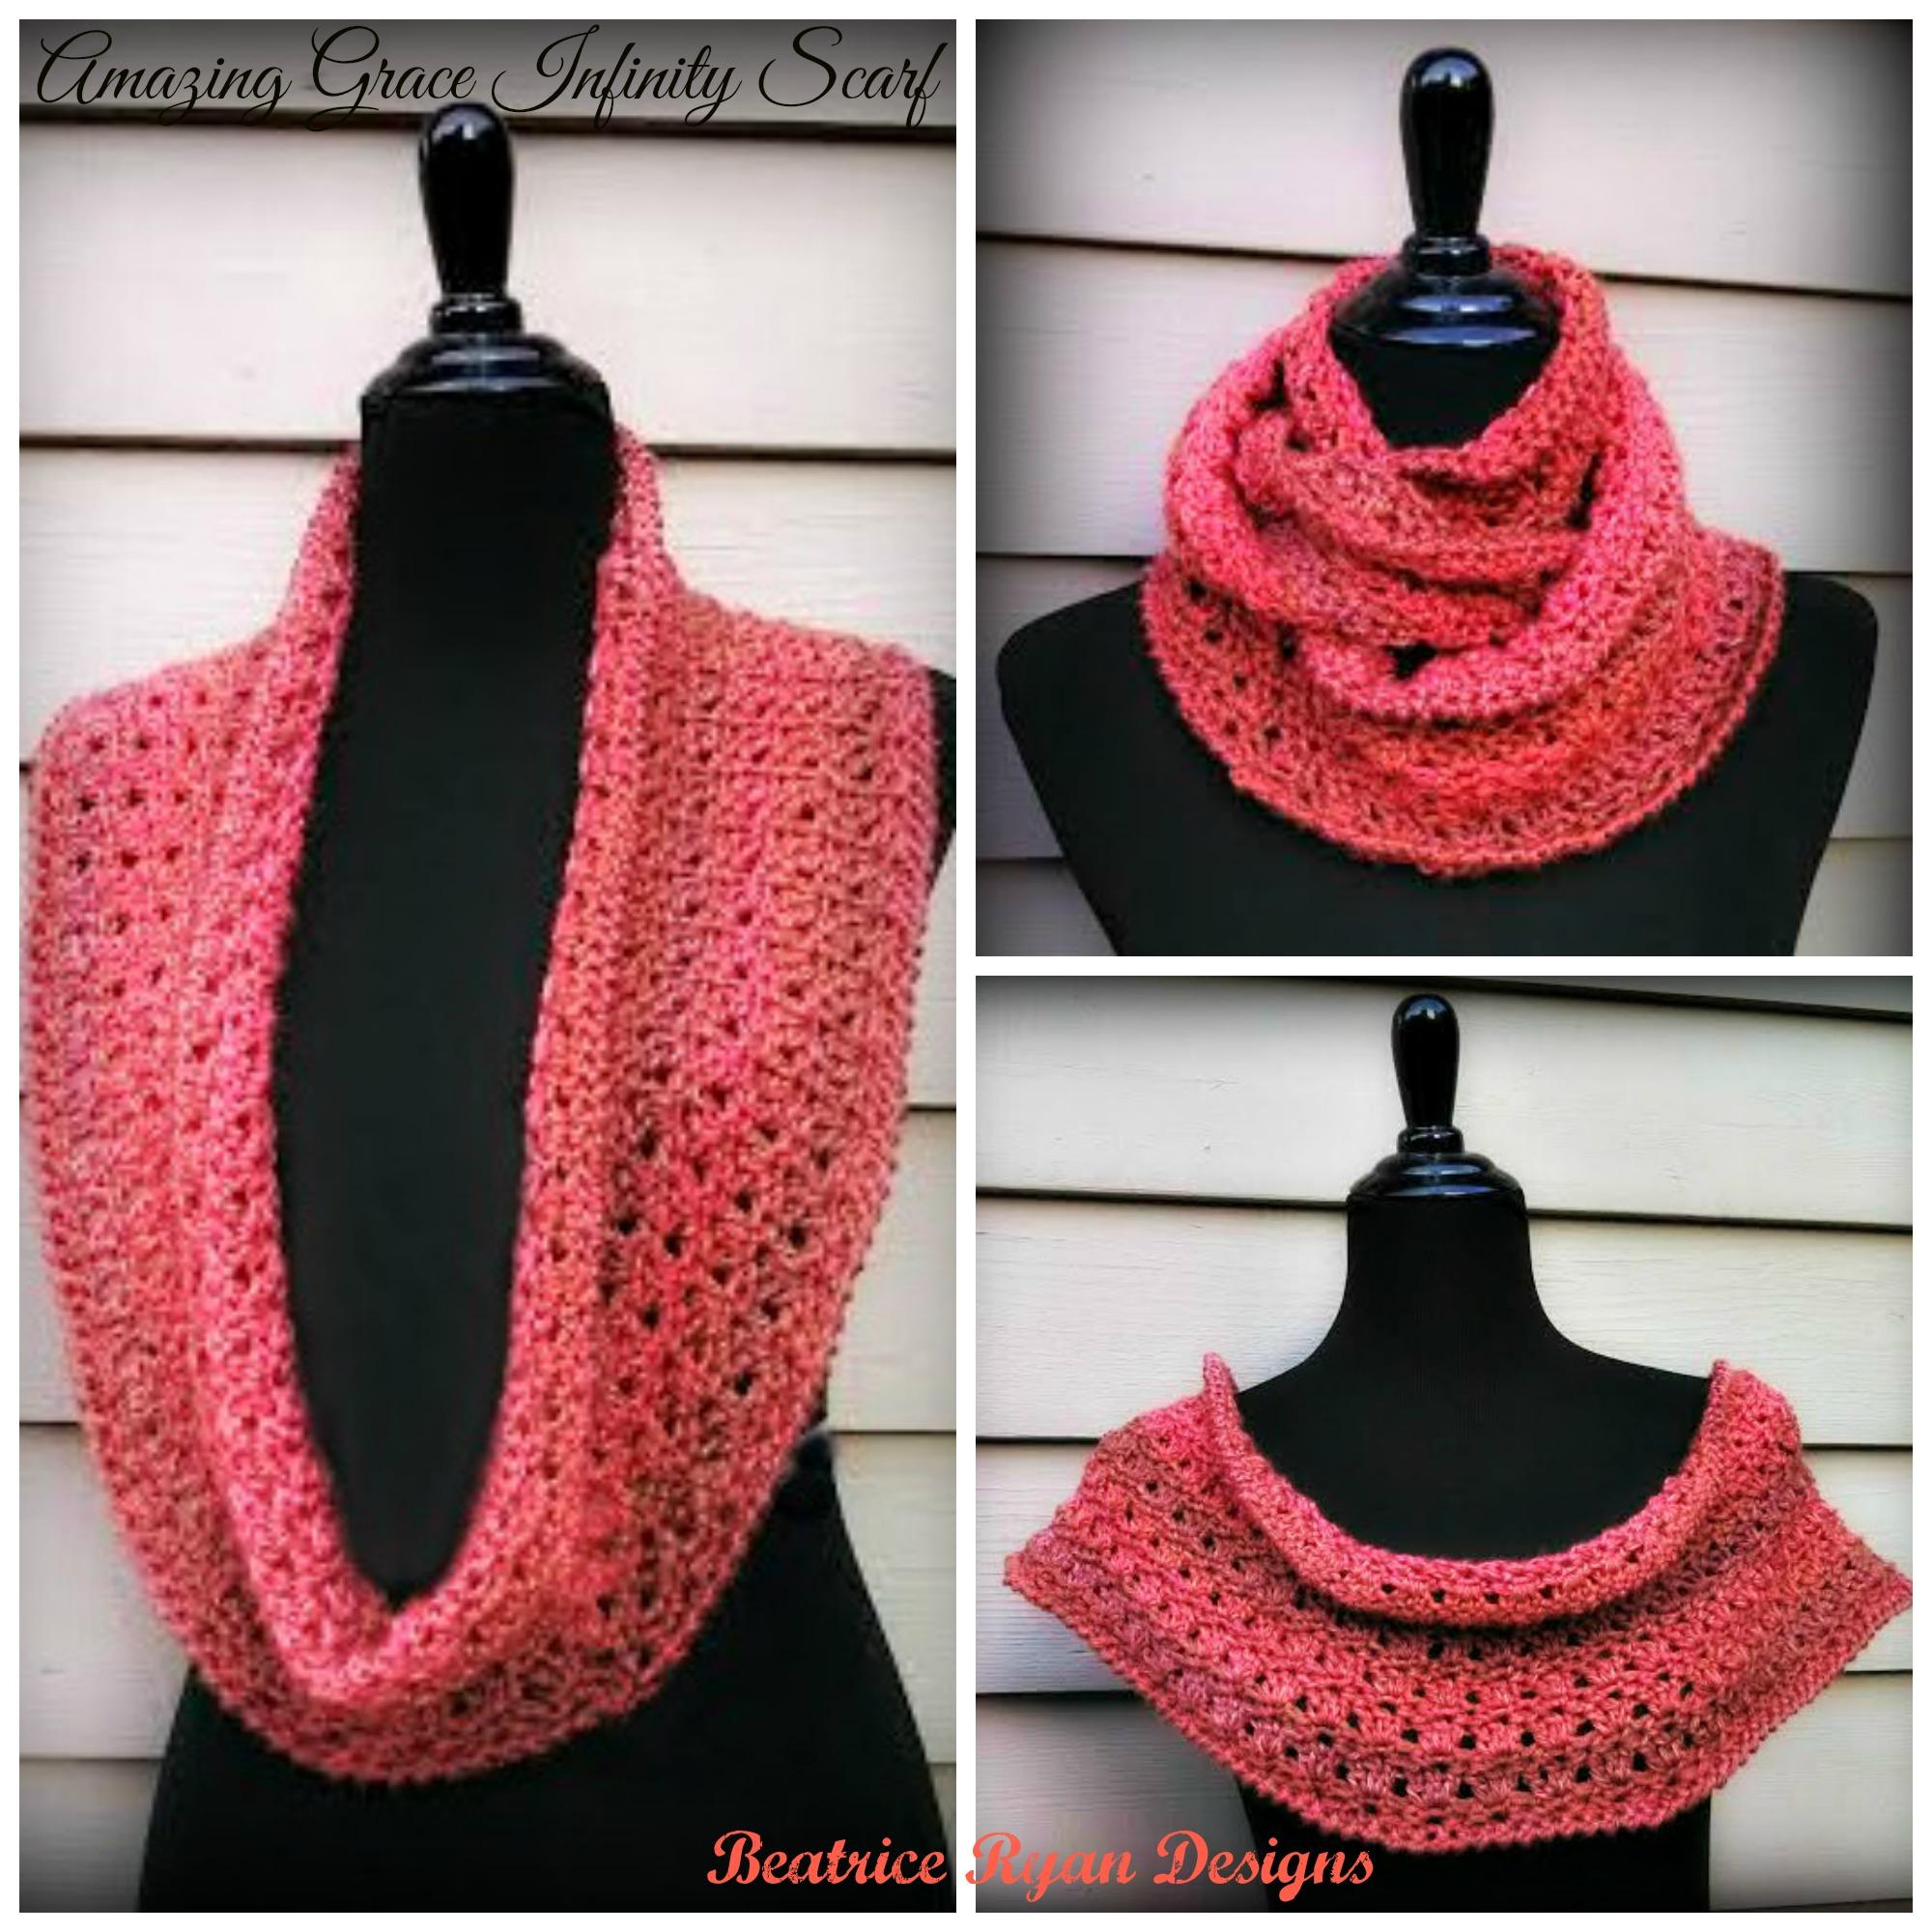 Amazing grace infinity scarf free crochet pattern amazing grace infinity scarf free crochet pattern bankloansurffo Choice Image